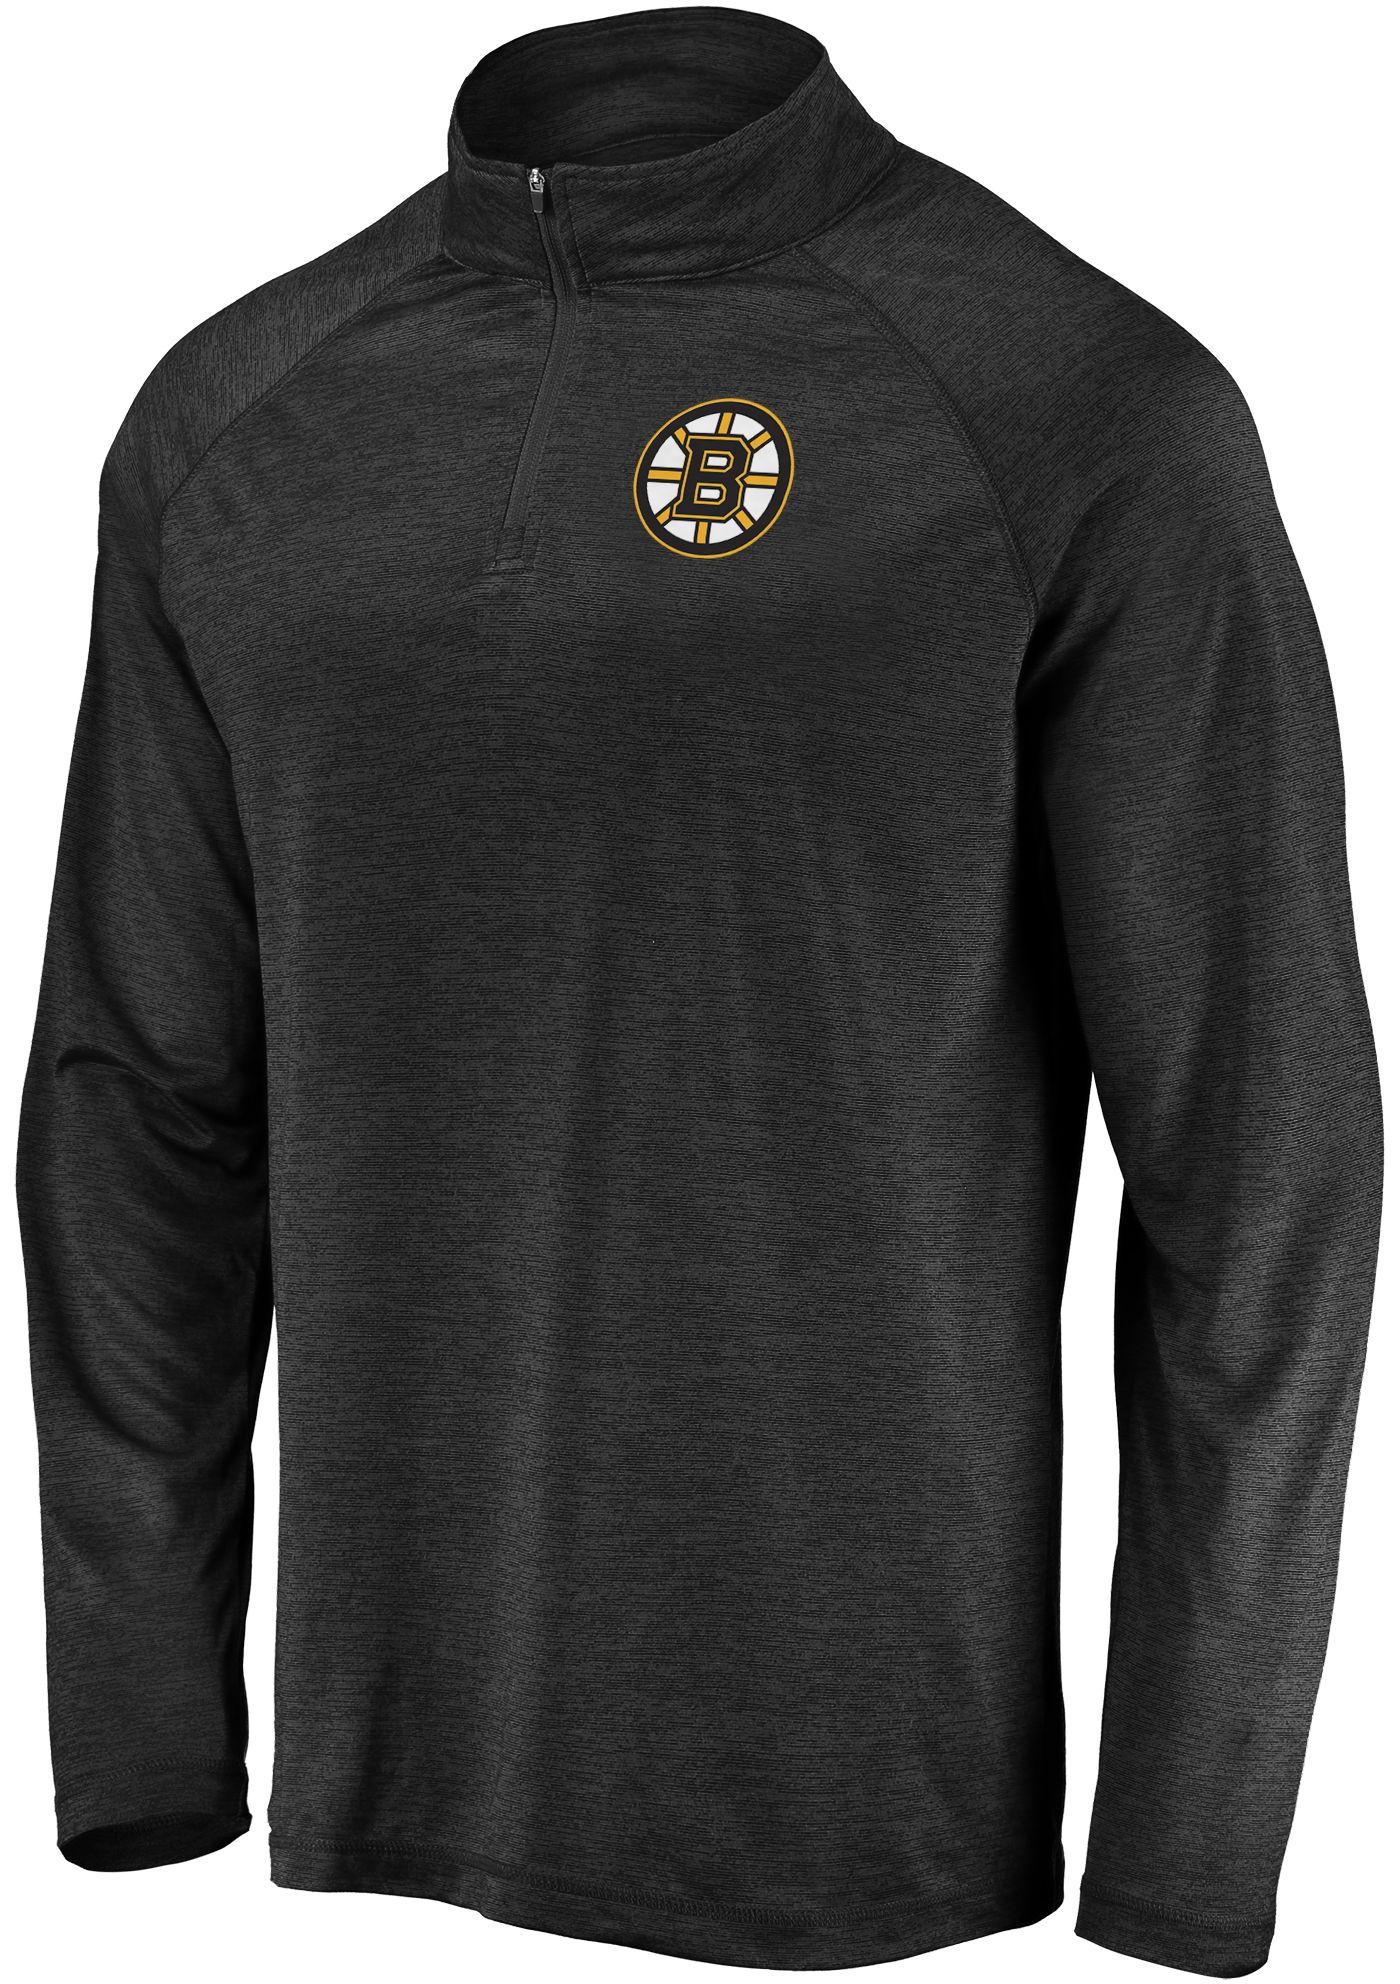 NHL Men's Boston Bruins Logo Black Heathered Quarter-Zip Pullover